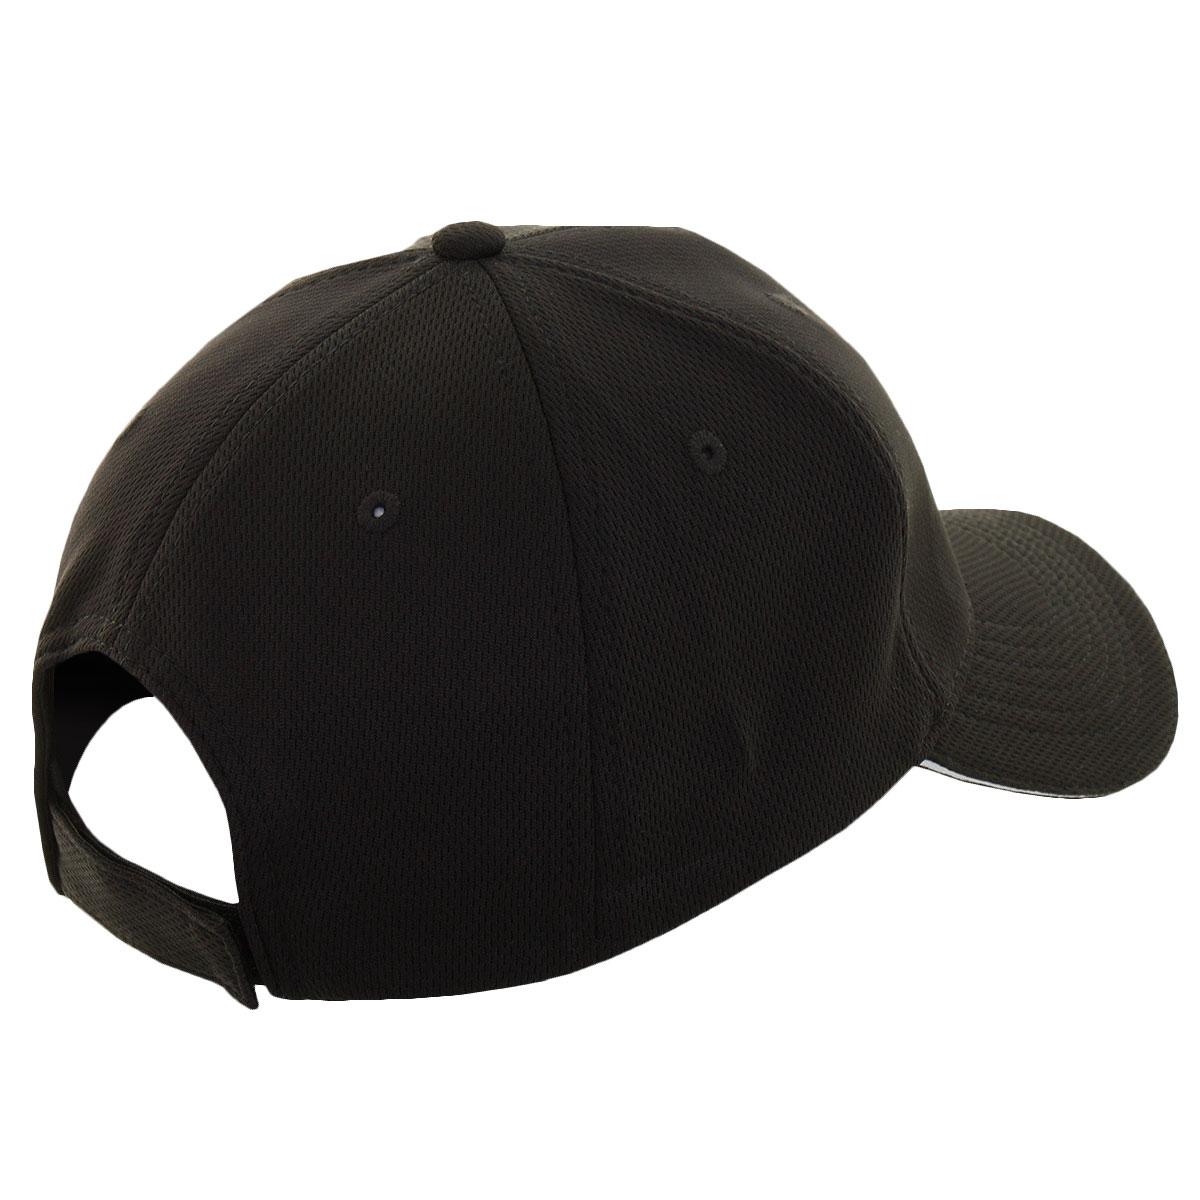 calvin klein golf 2017 mens ck airtex adjustable mesh cap baseball hat. Black Bedroom Furniture Sets. Home Design Ideas